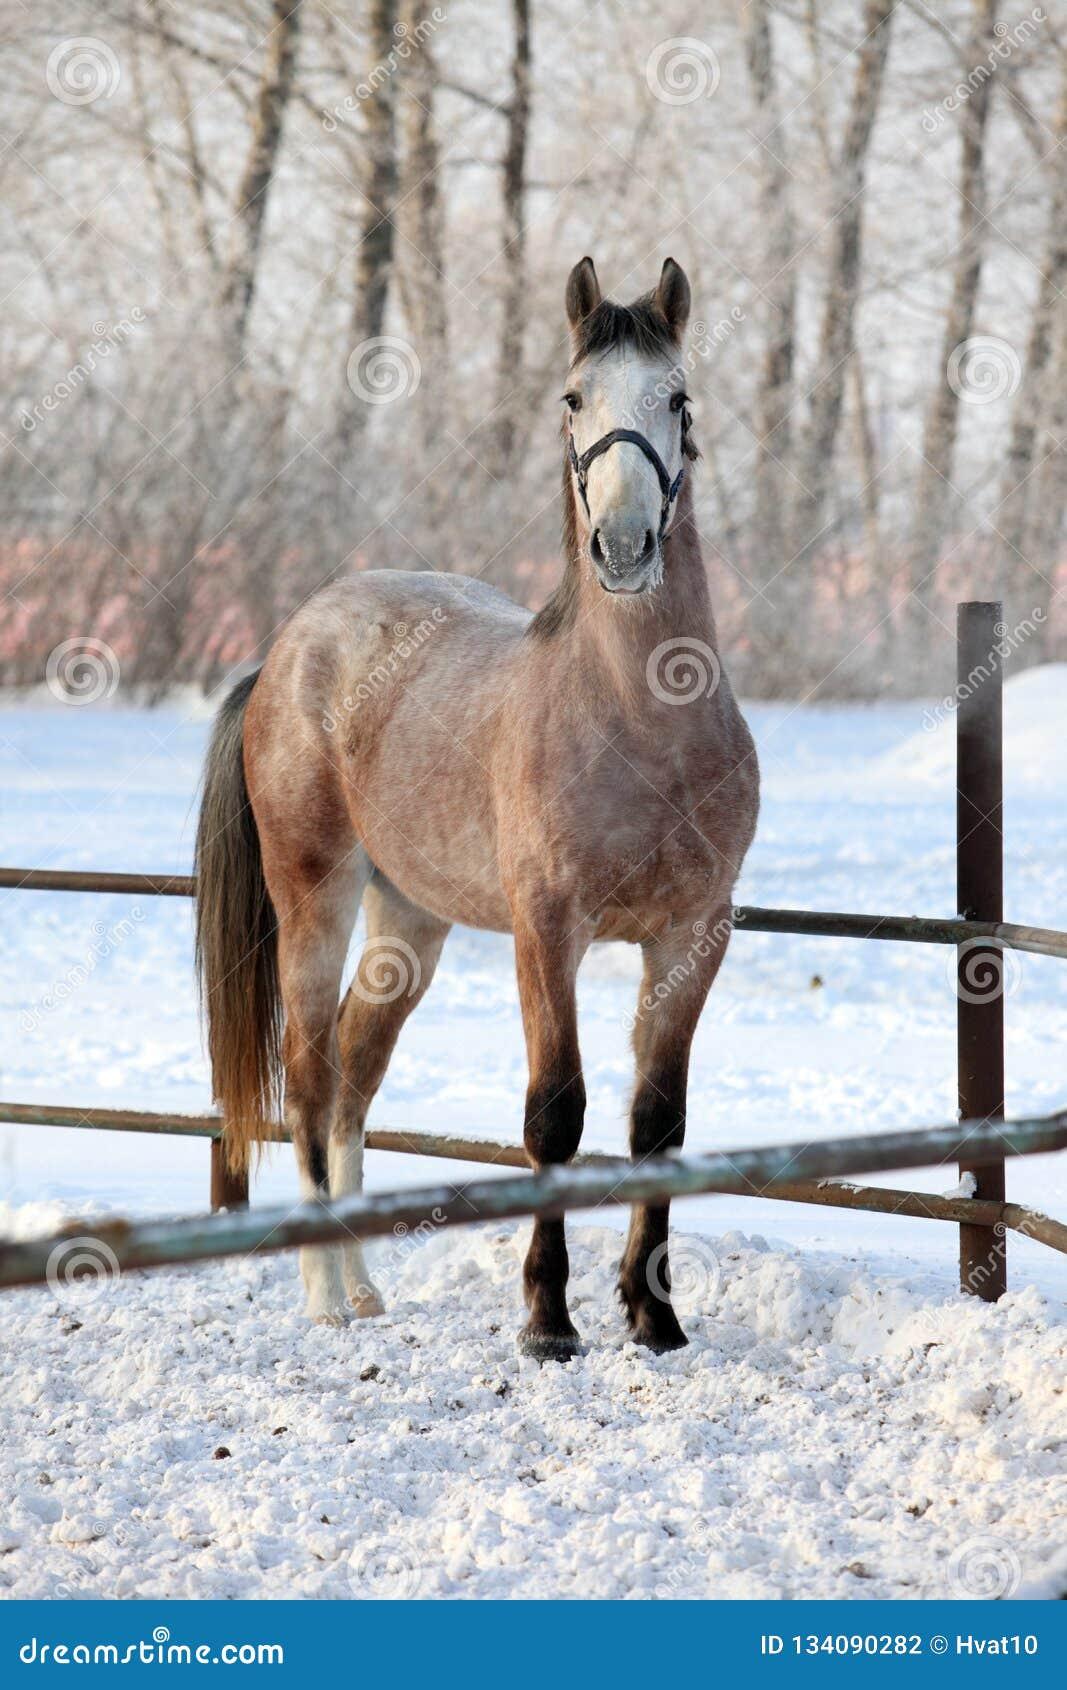 842 Dapple Grey Horse Photos Free Royalty Free Stock Photos From Dreamstime